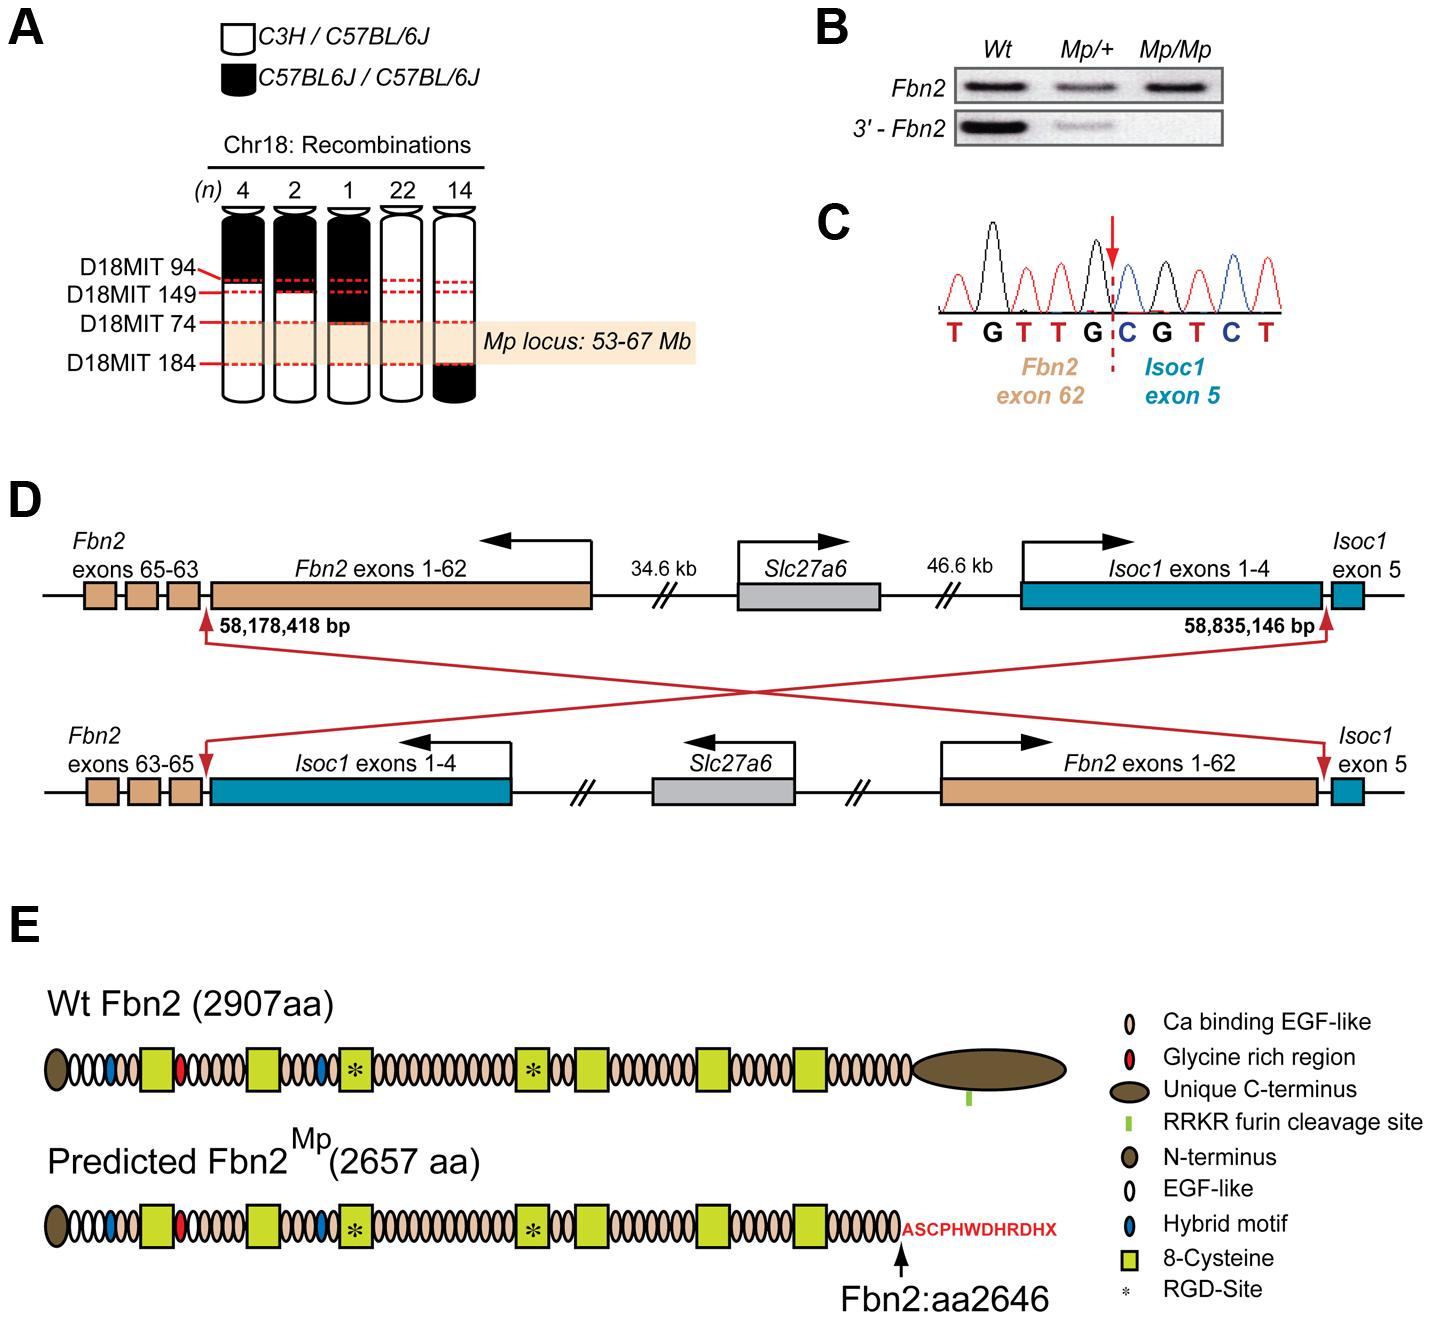 <i>Mp</i> mapped to a balanced 660 kb inversion on chromosome 18 disrupting <i>Fbn2</i> and <i>Isoc1</i>.